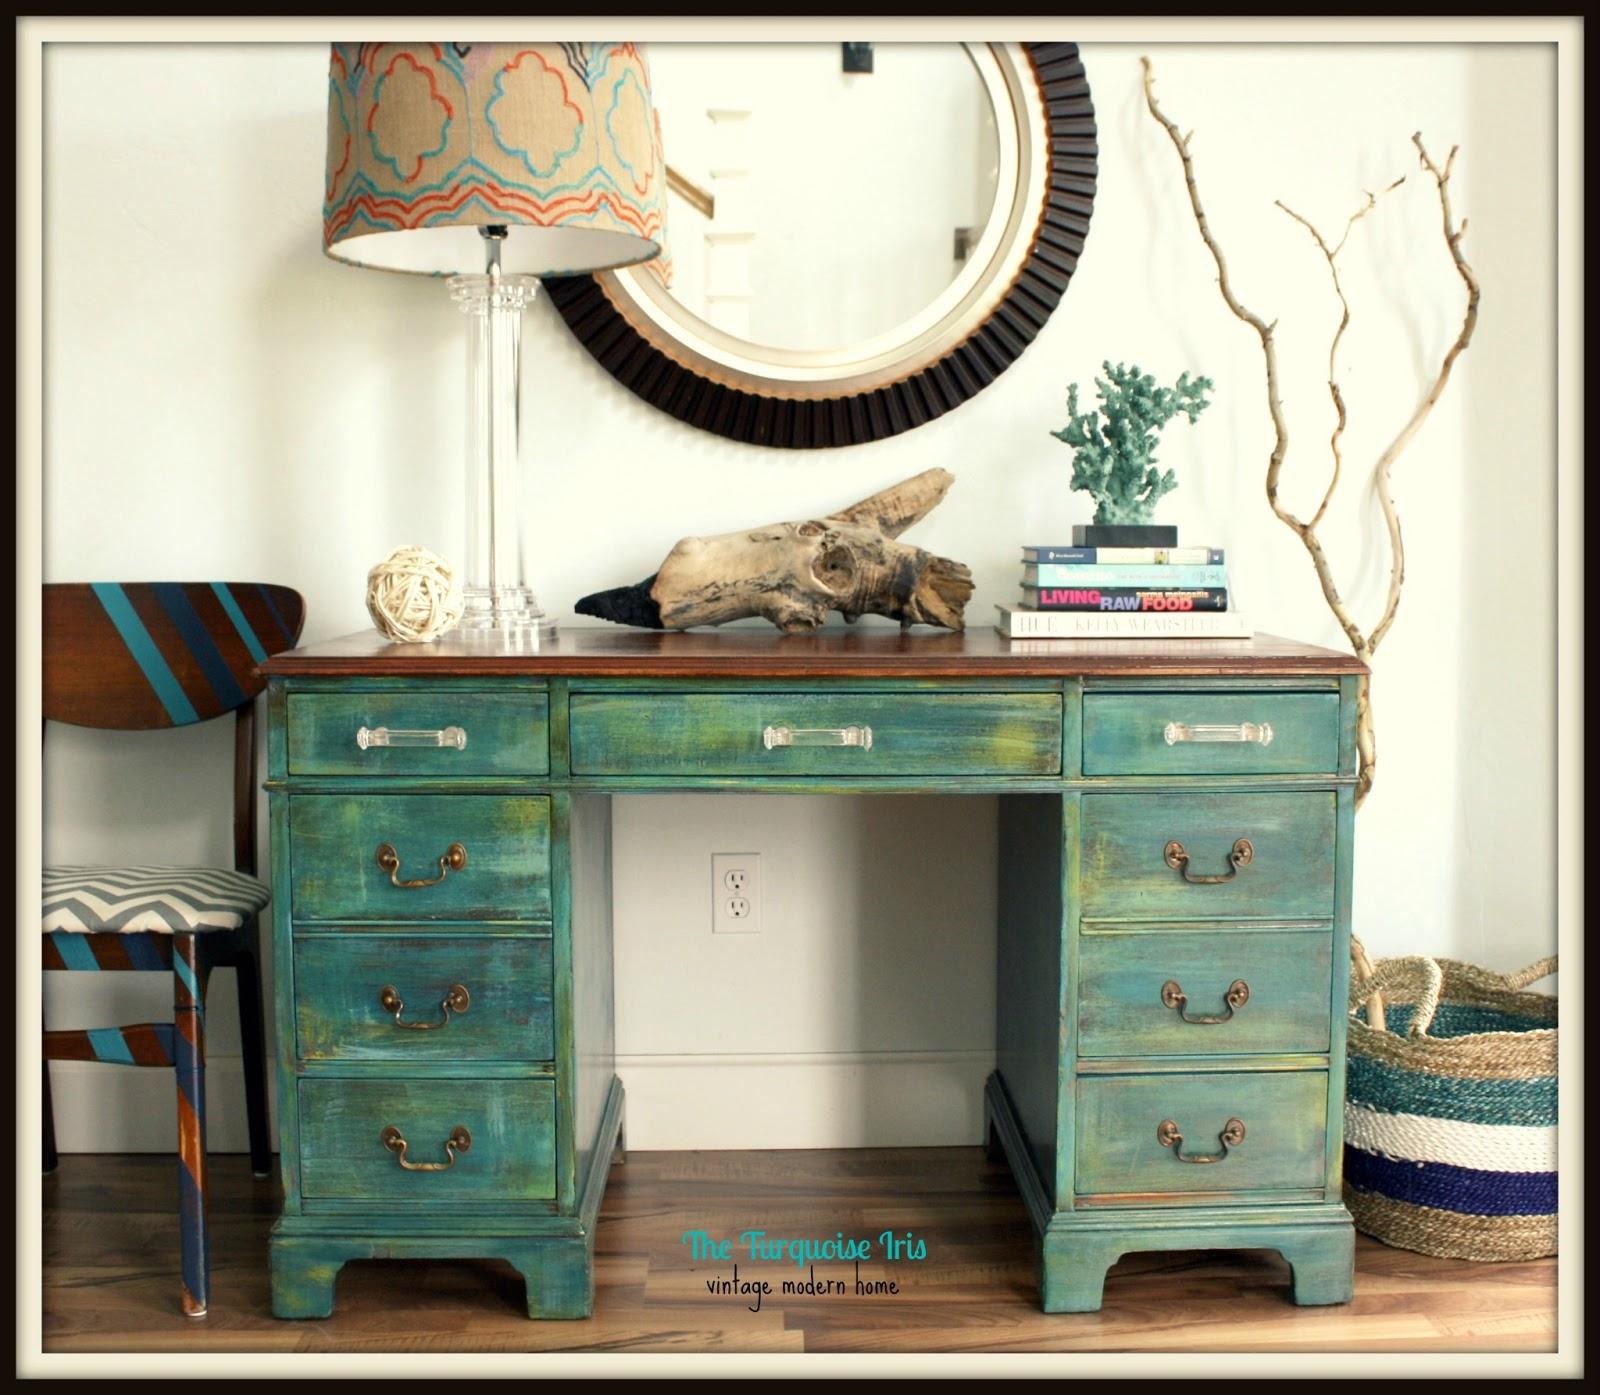 The Turquoise Iris  Furniture  Art Teal Distressed